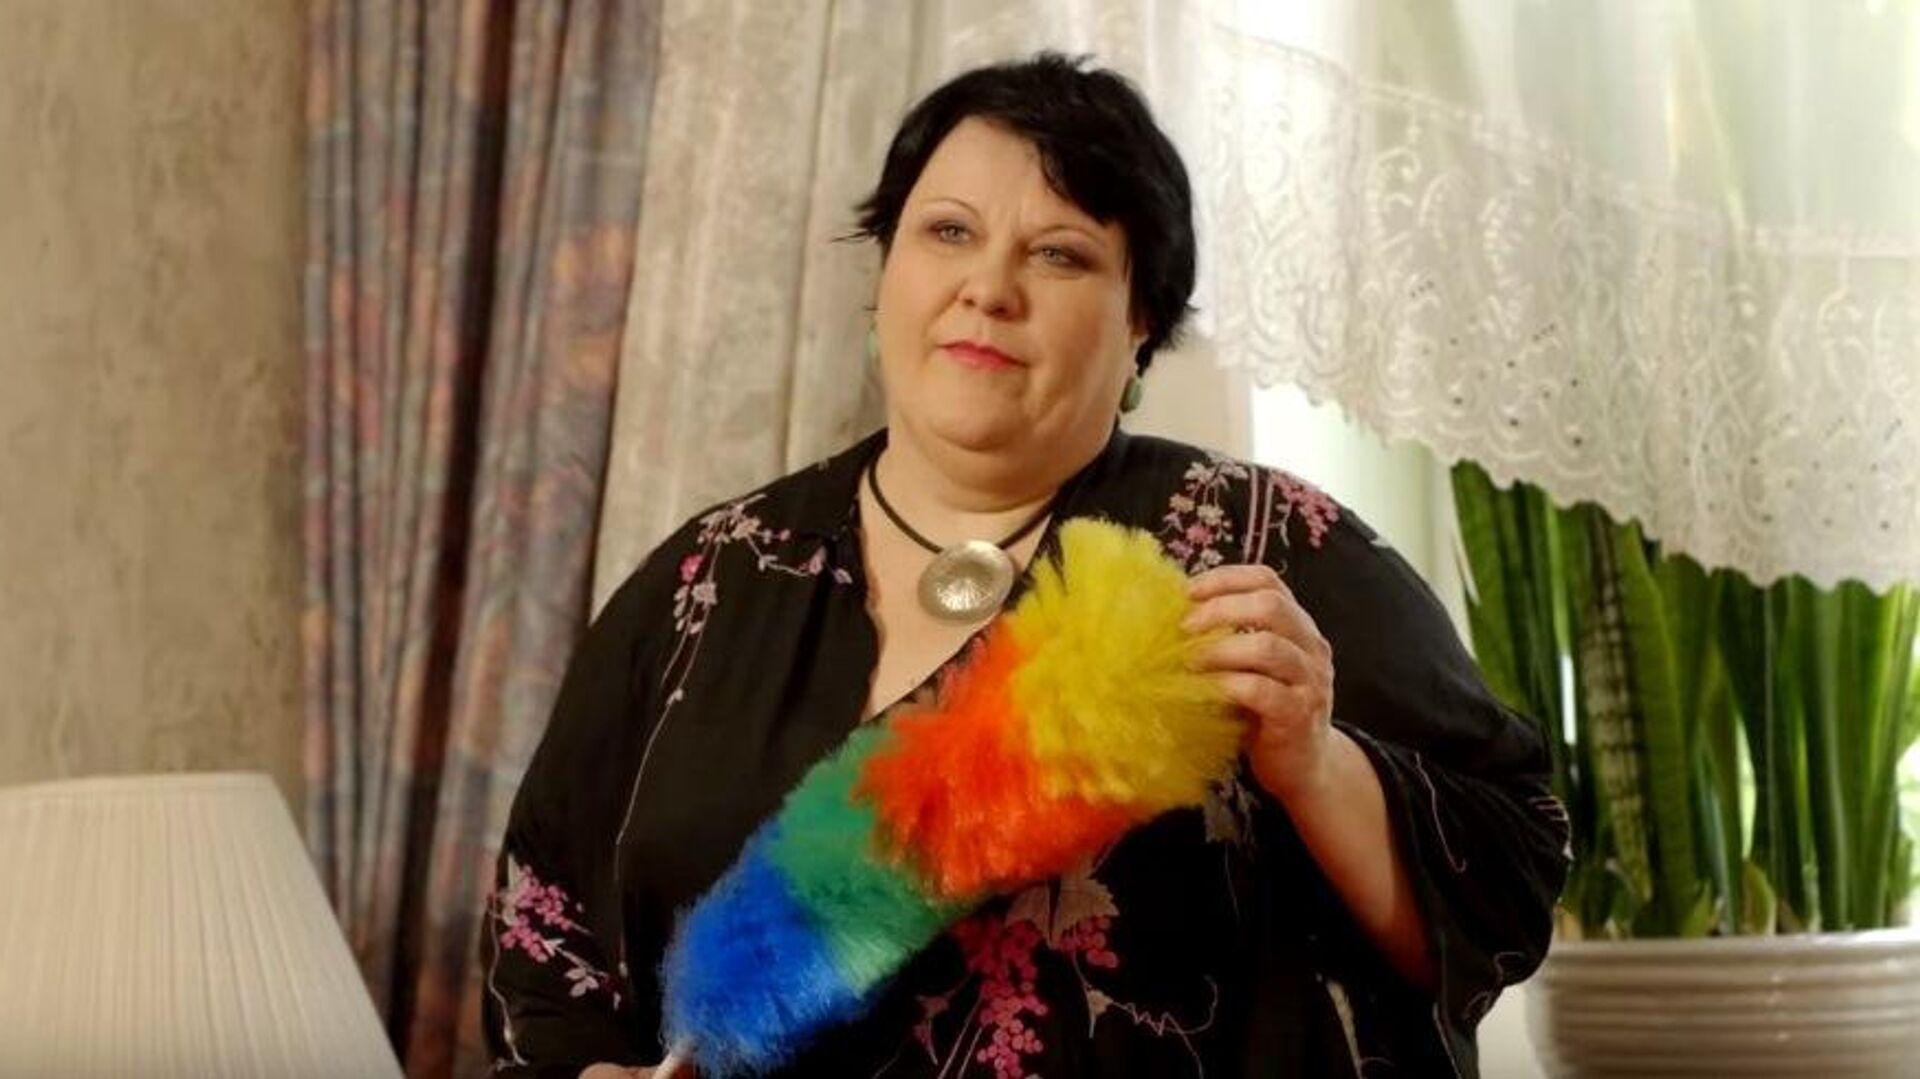 Умерла актриса Наталья Смирнова - РИА Новости, 01.07.2021